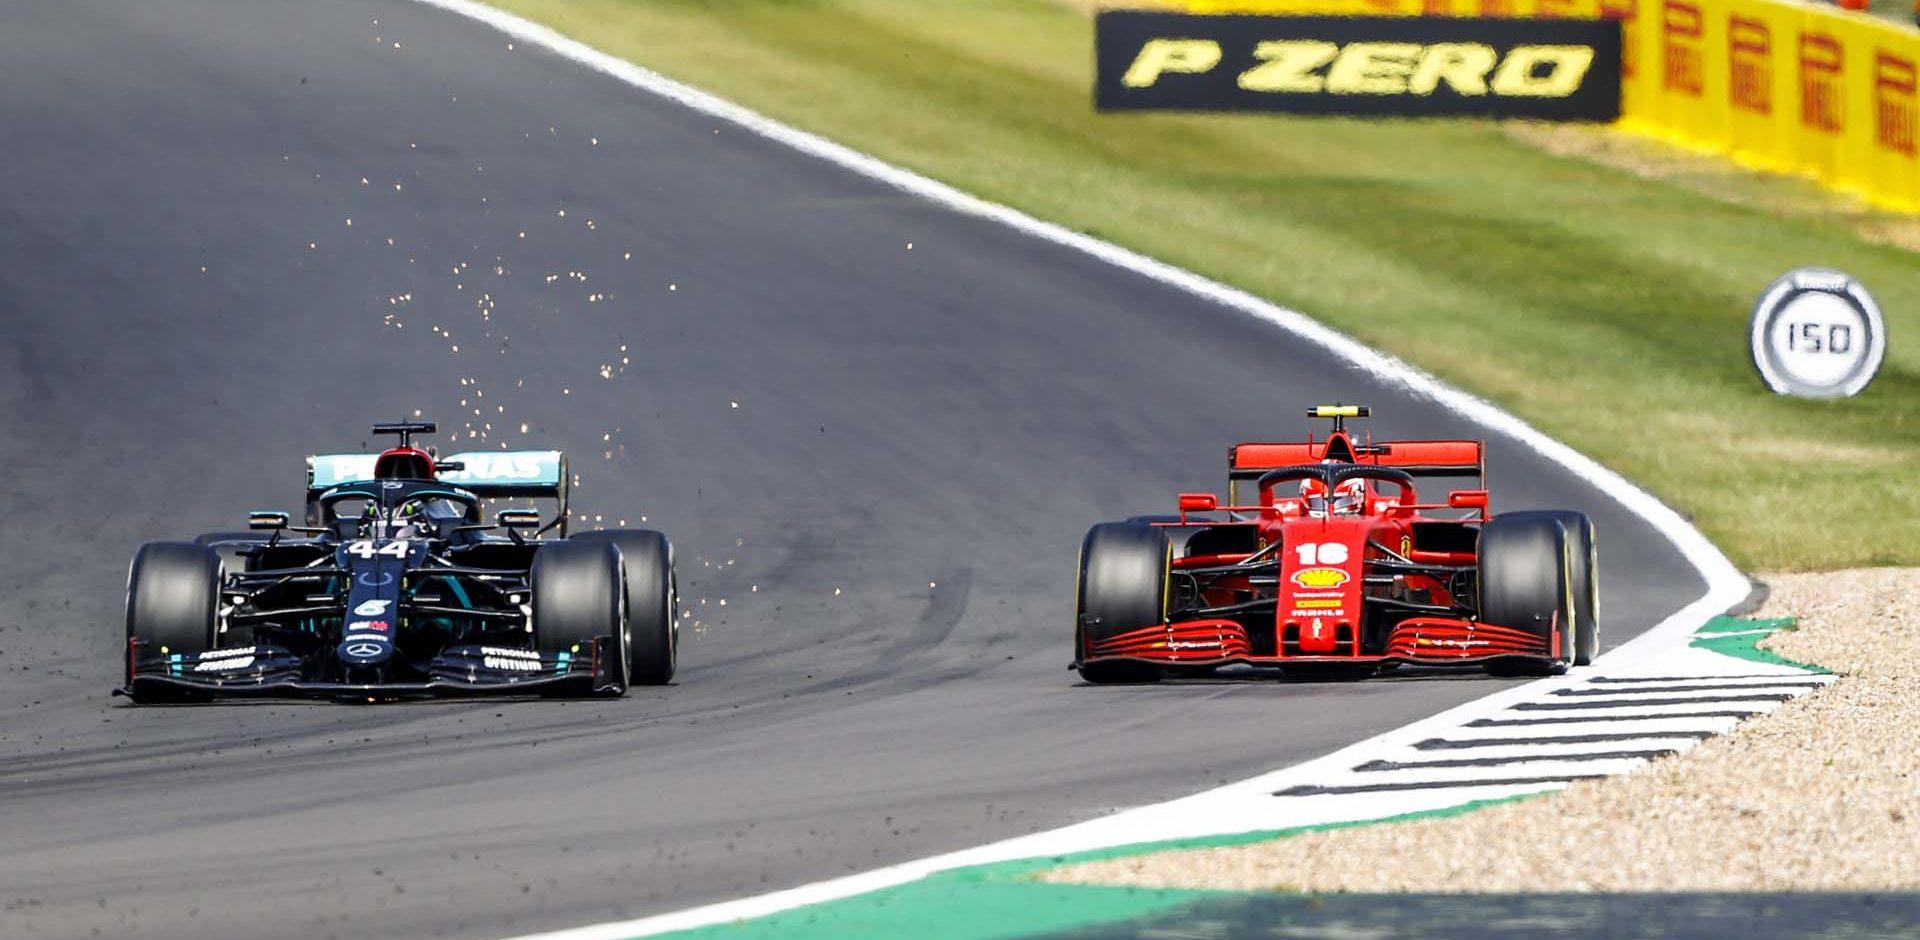 2020 70th Anniversary Grand Prix, Sunday - LAT Images Lewis Hamilton Mercedes Charles Leclerc Ferrari overtake